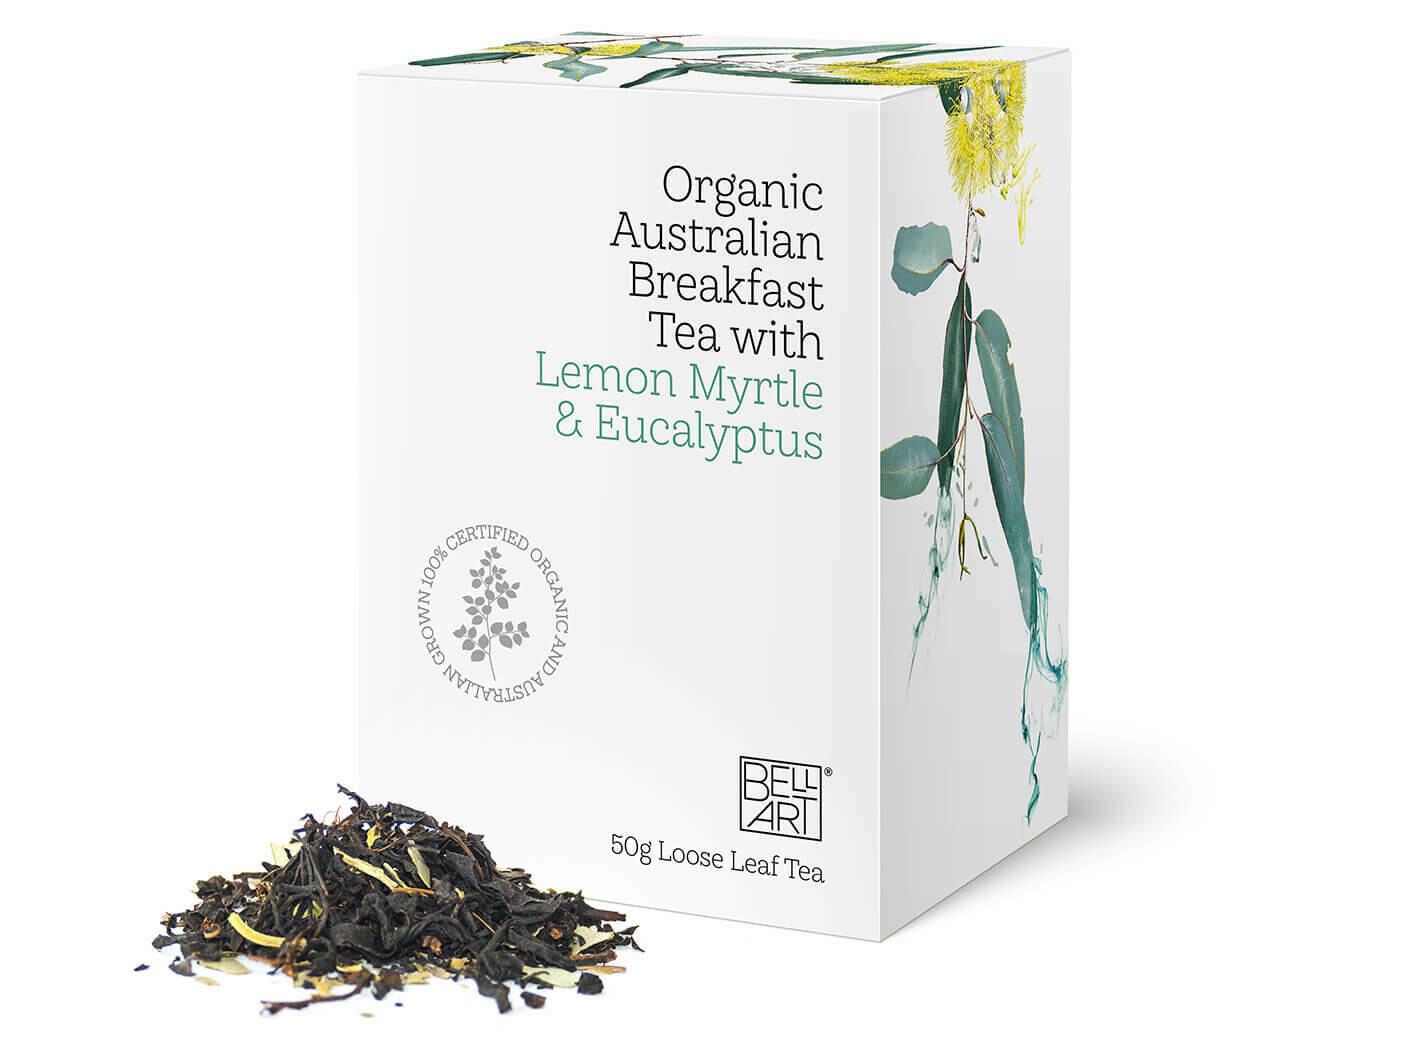 BELL ART -  Organic Australian Breakfast Tea with Eucalyptus & Lemon Myrtle